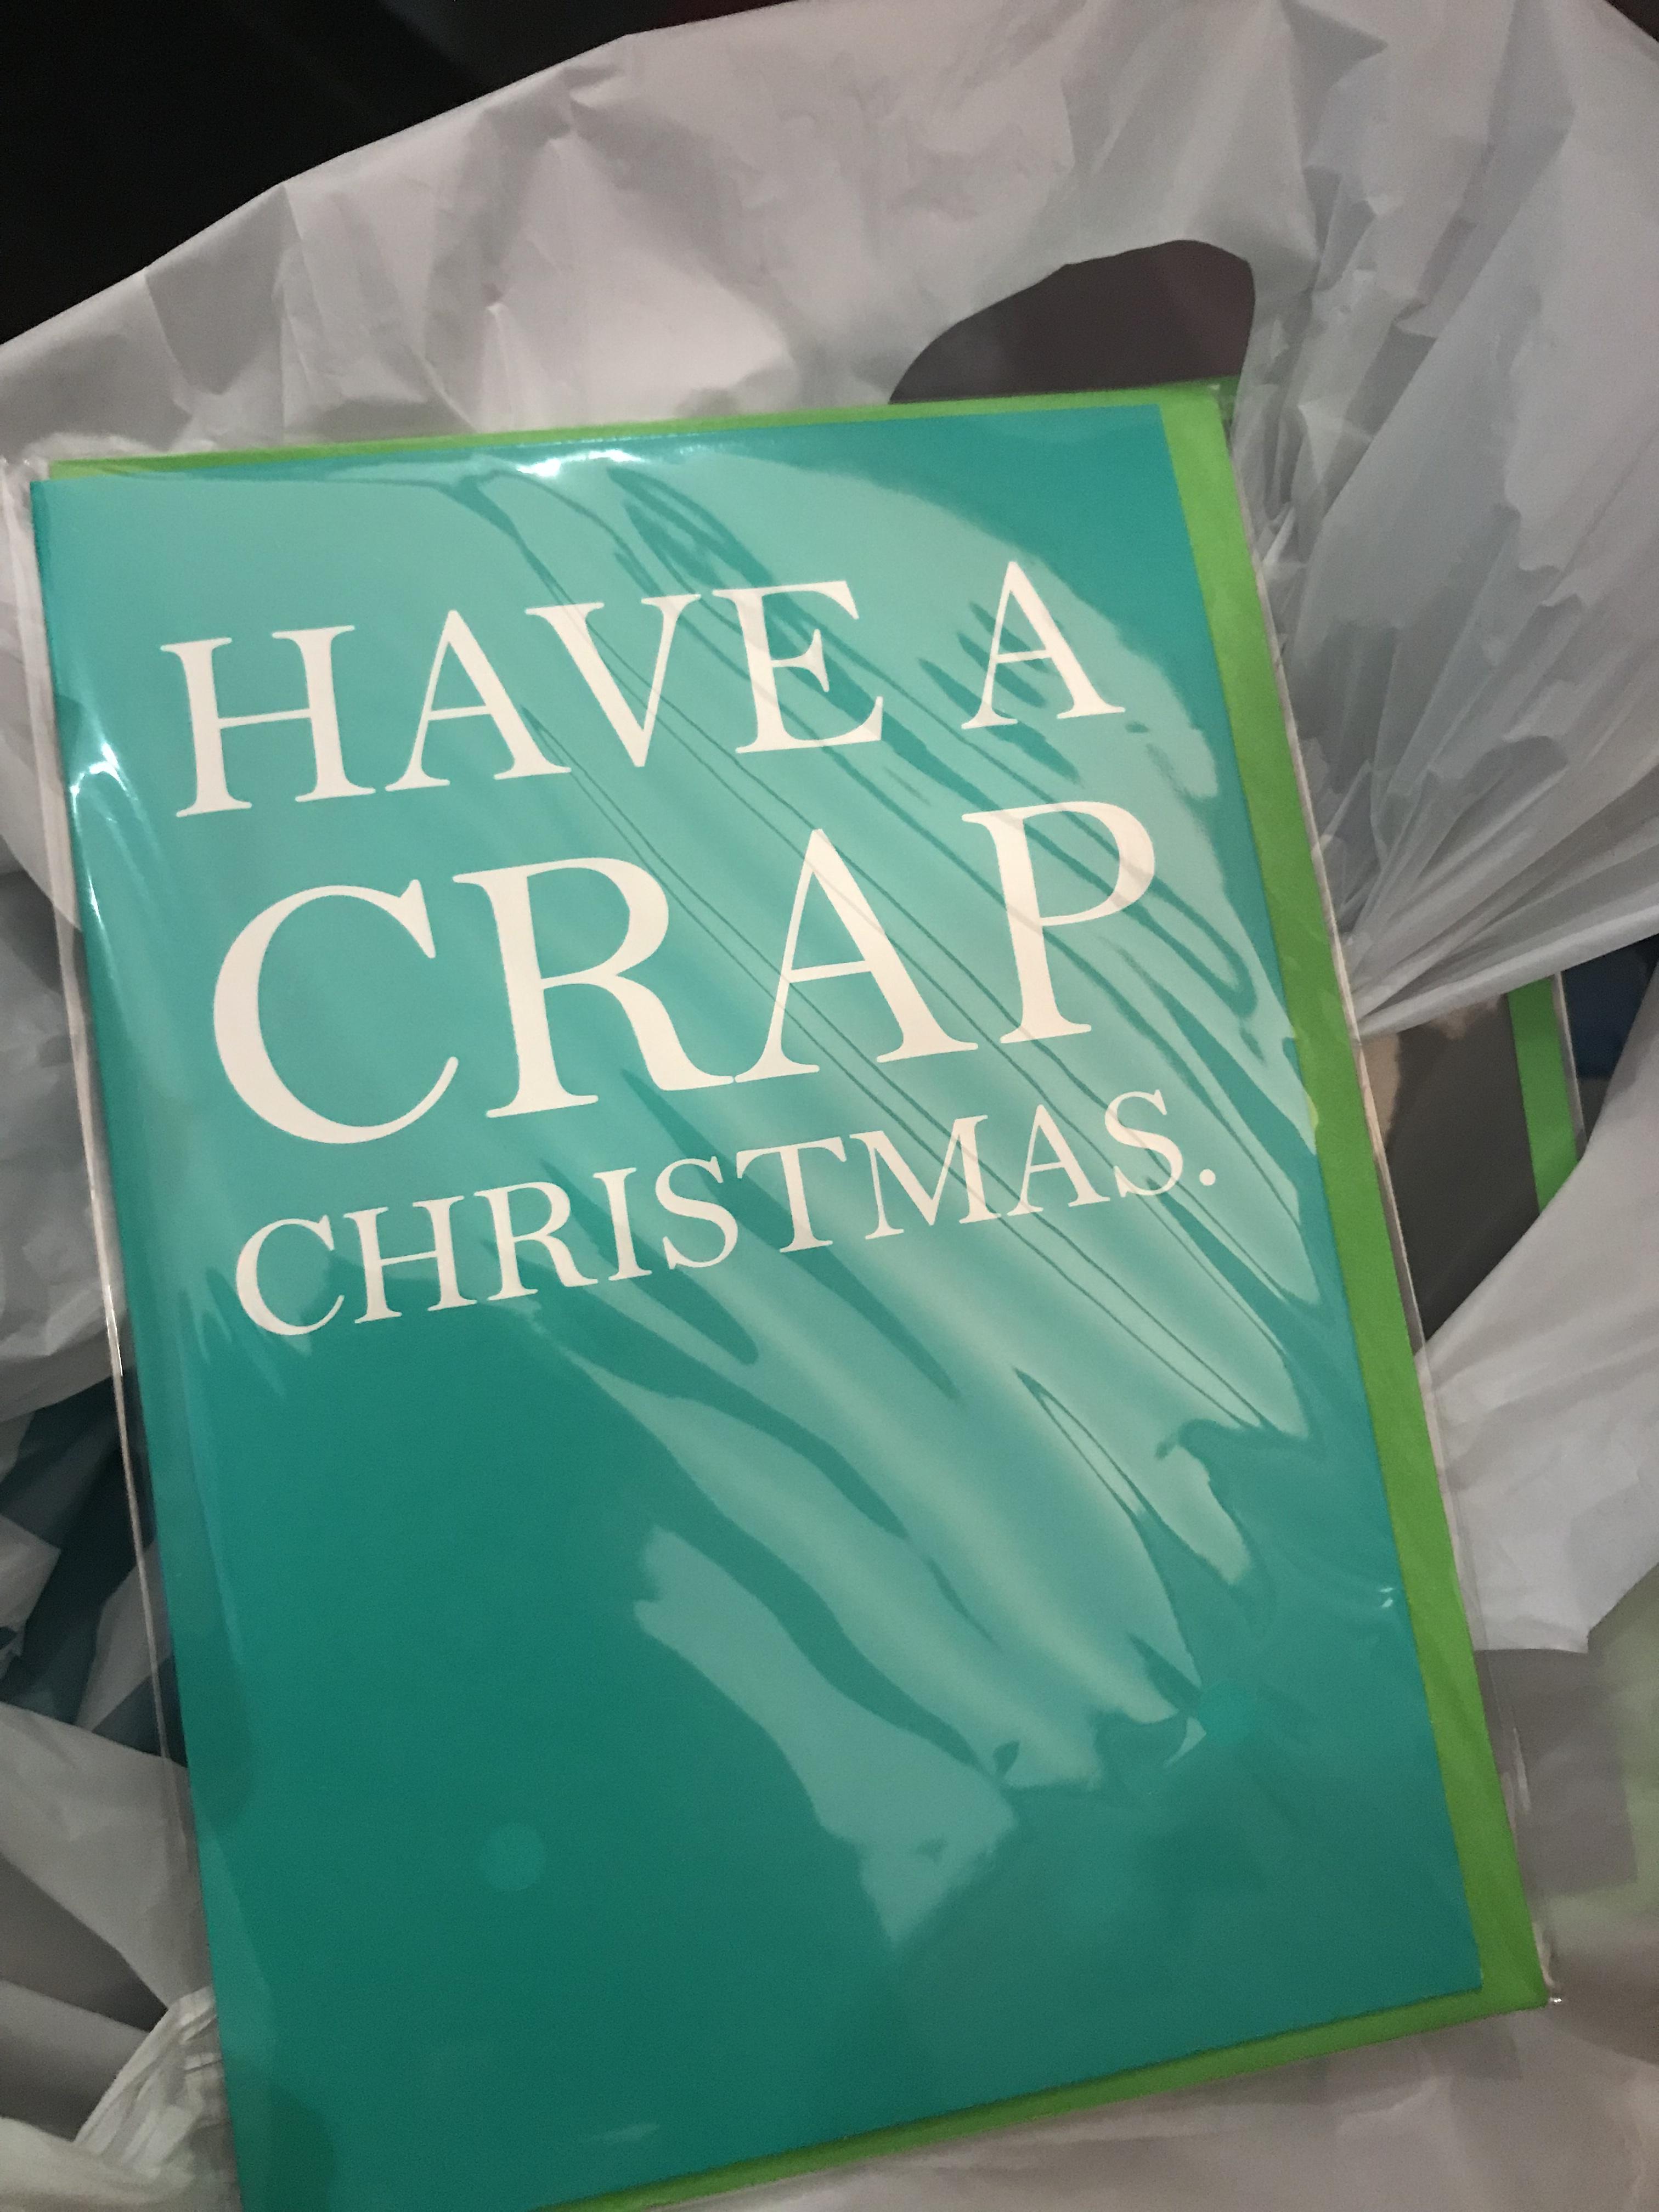 Poundland Offensive But Hilarious Christmas Mugs and Cards - hotukdeals